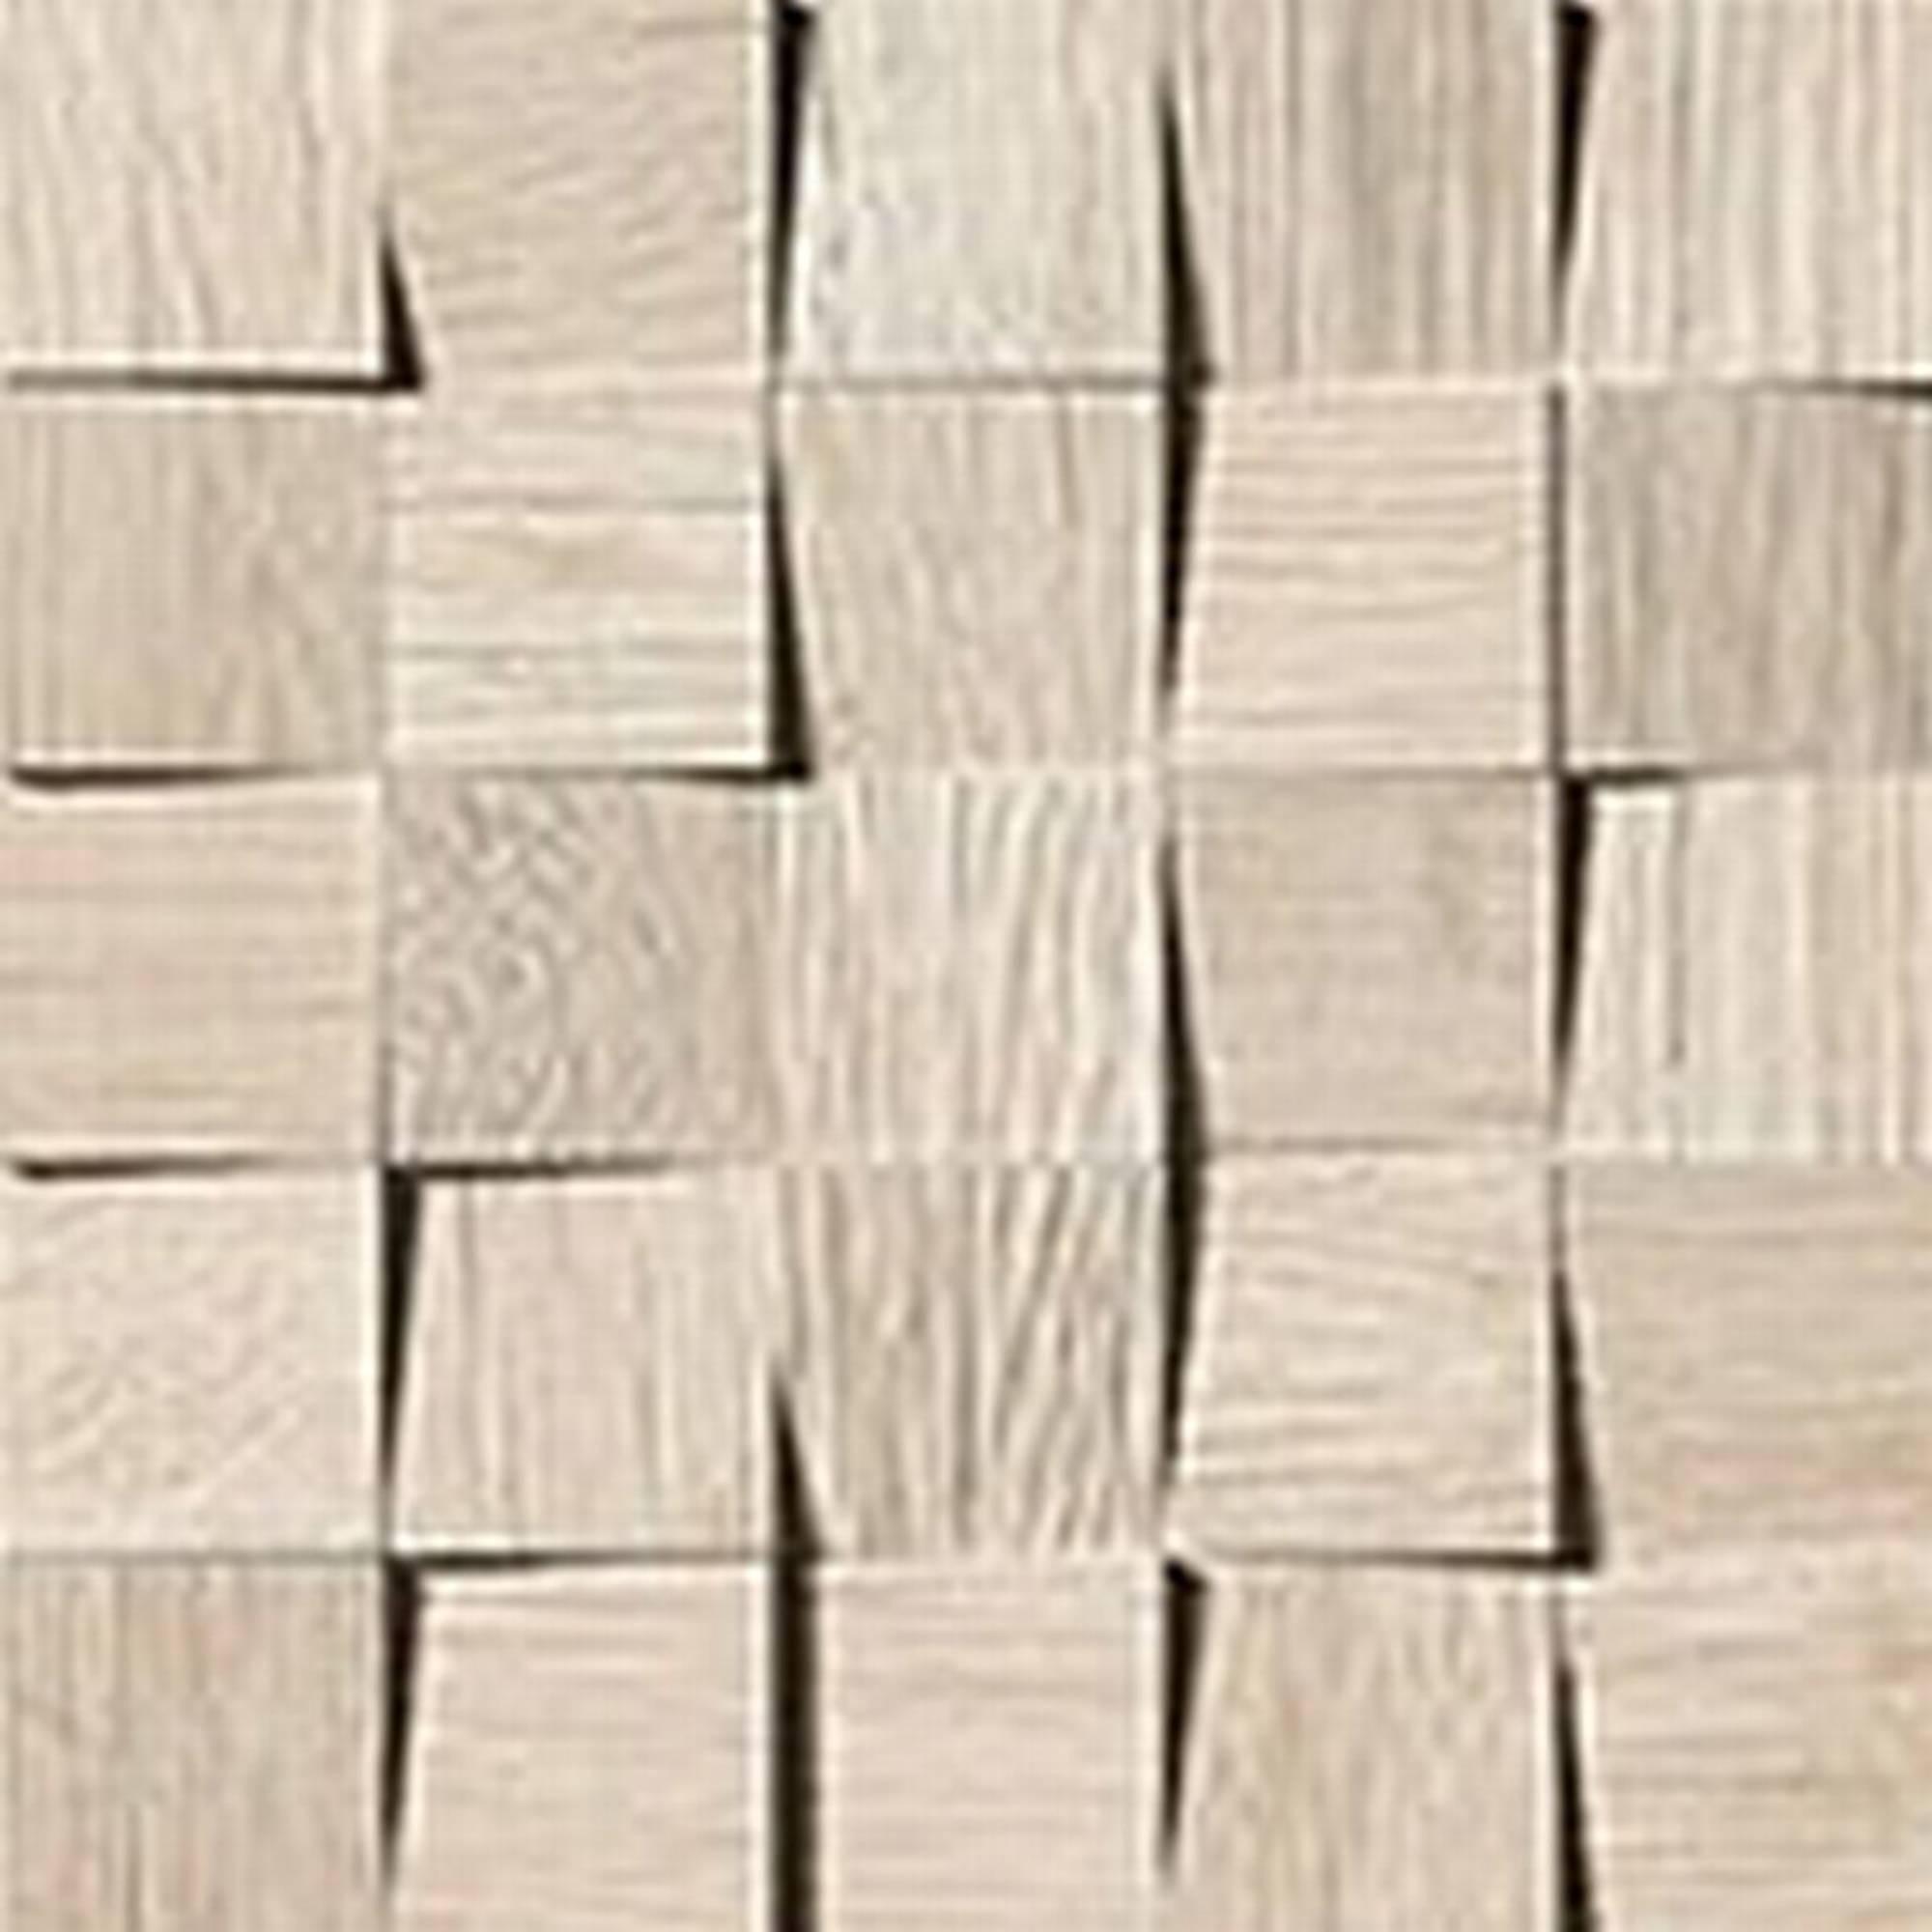 ATLAS CONCORDE AXI tegelmat 35 x 35 cm. doos a 6 stuks WHITE PINE (AMV7)